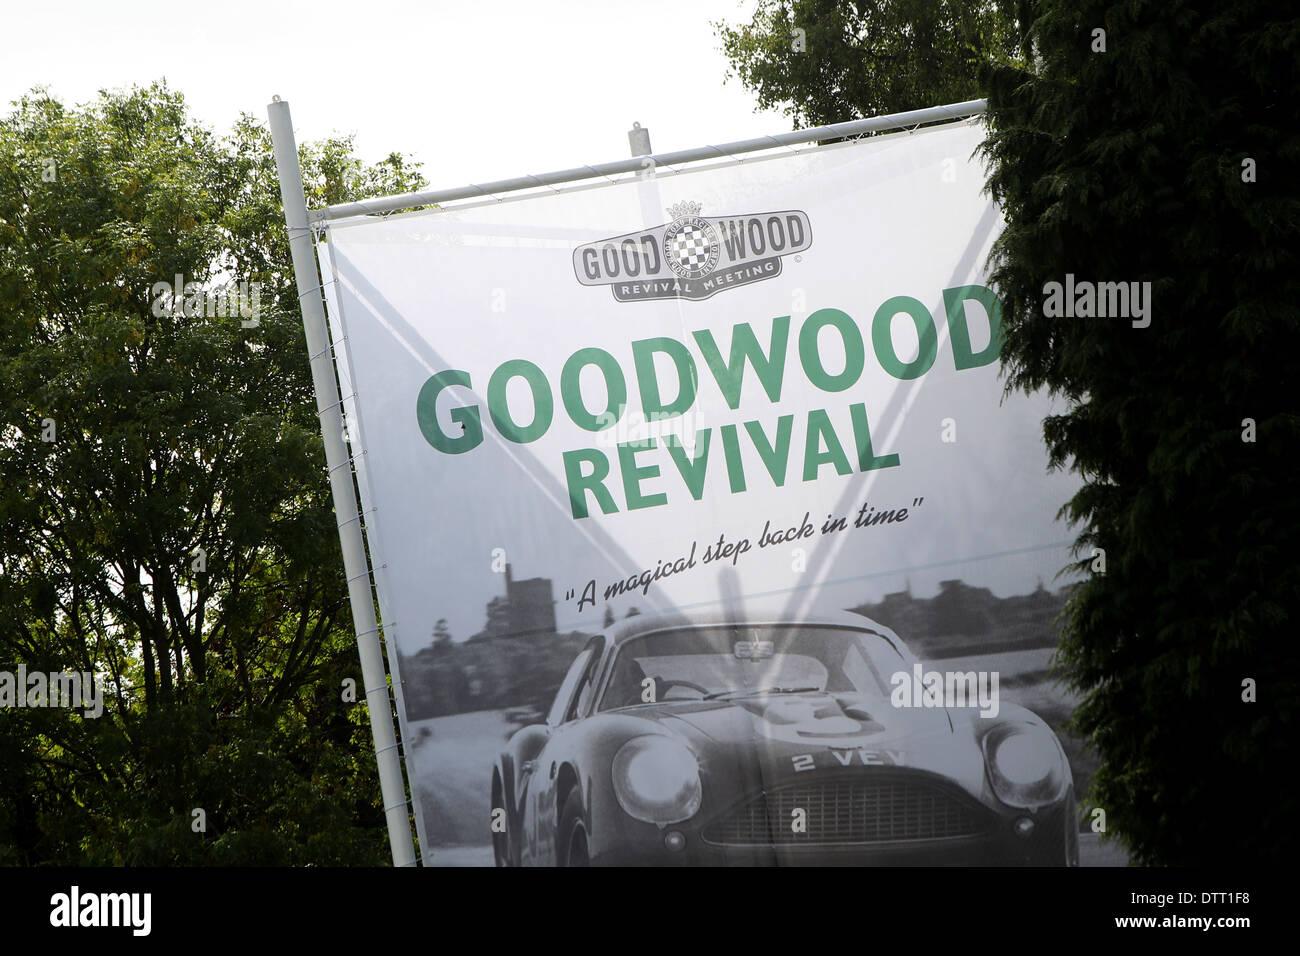 Ortseingangsschild für das Goodwood Revival 2013 Stockbild